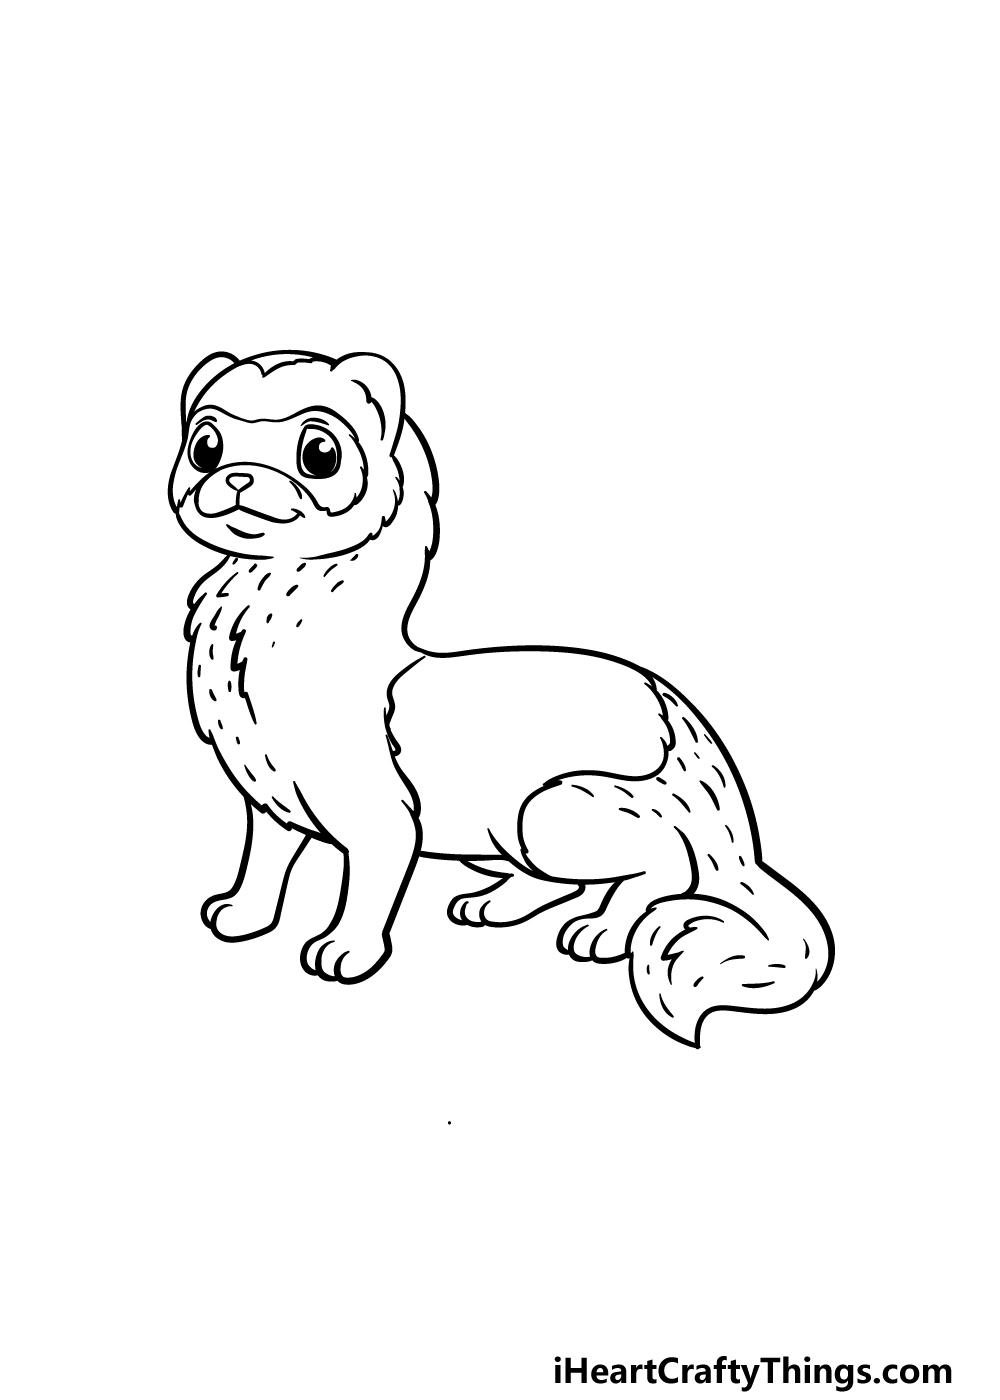 drawing a ferret step 5